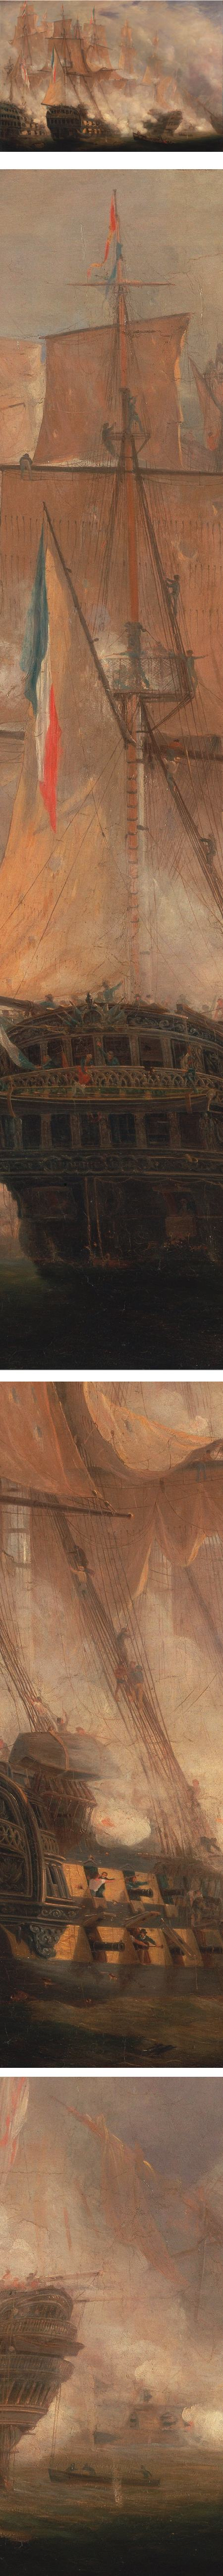 The Battle of Tragalgar, John Christian Schetky